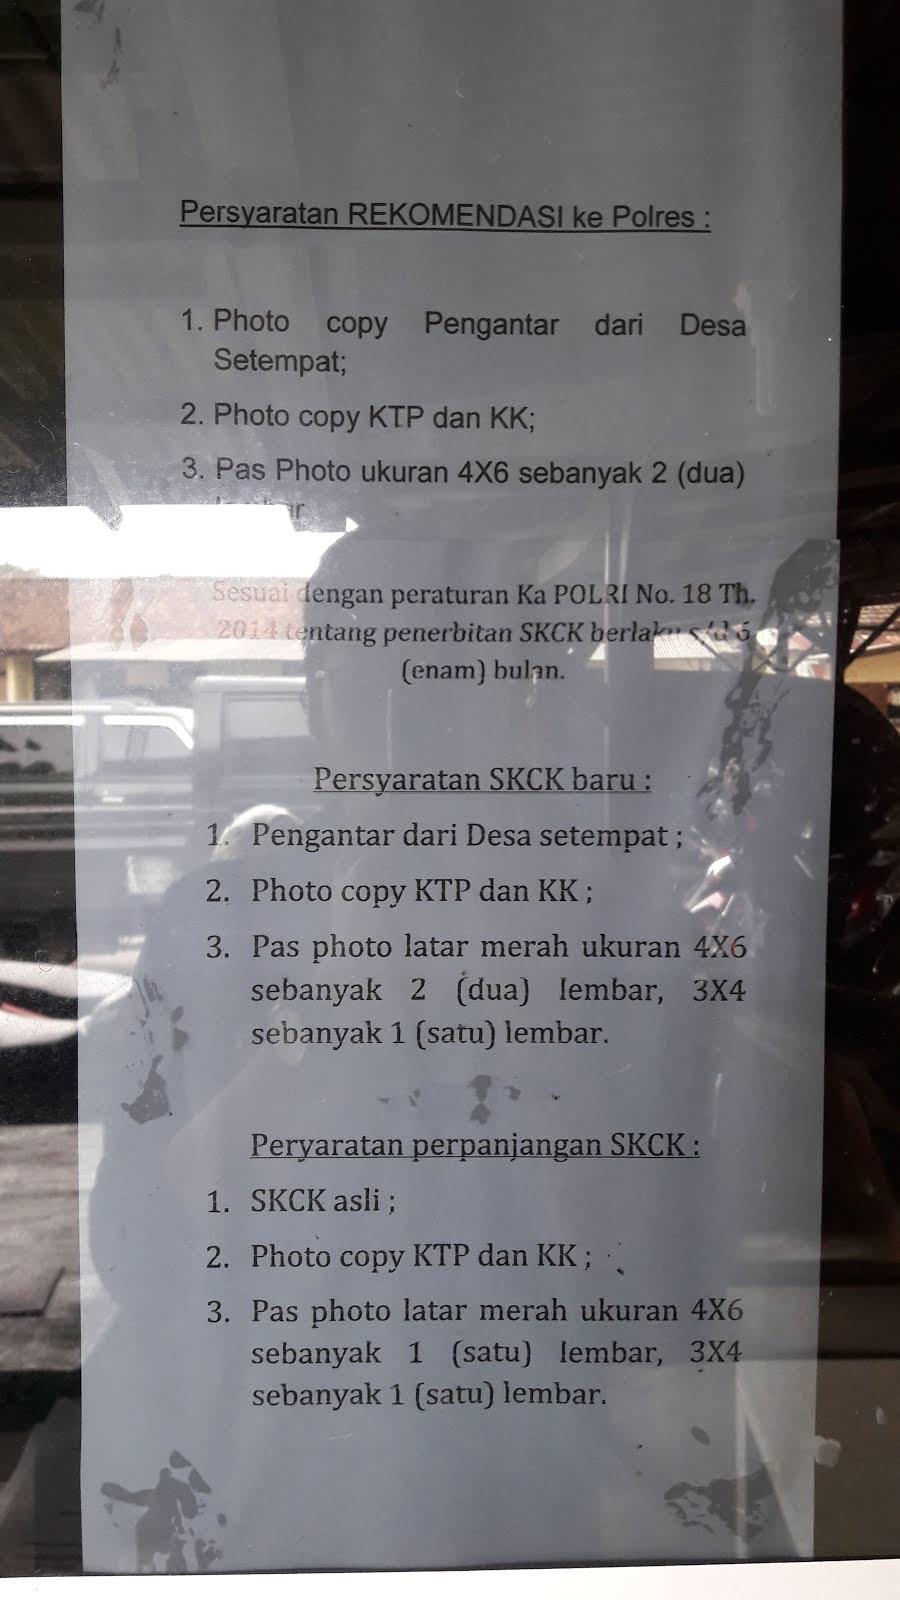 Bandung Semua Pembuatan Skck Di Polsek Di Bandung